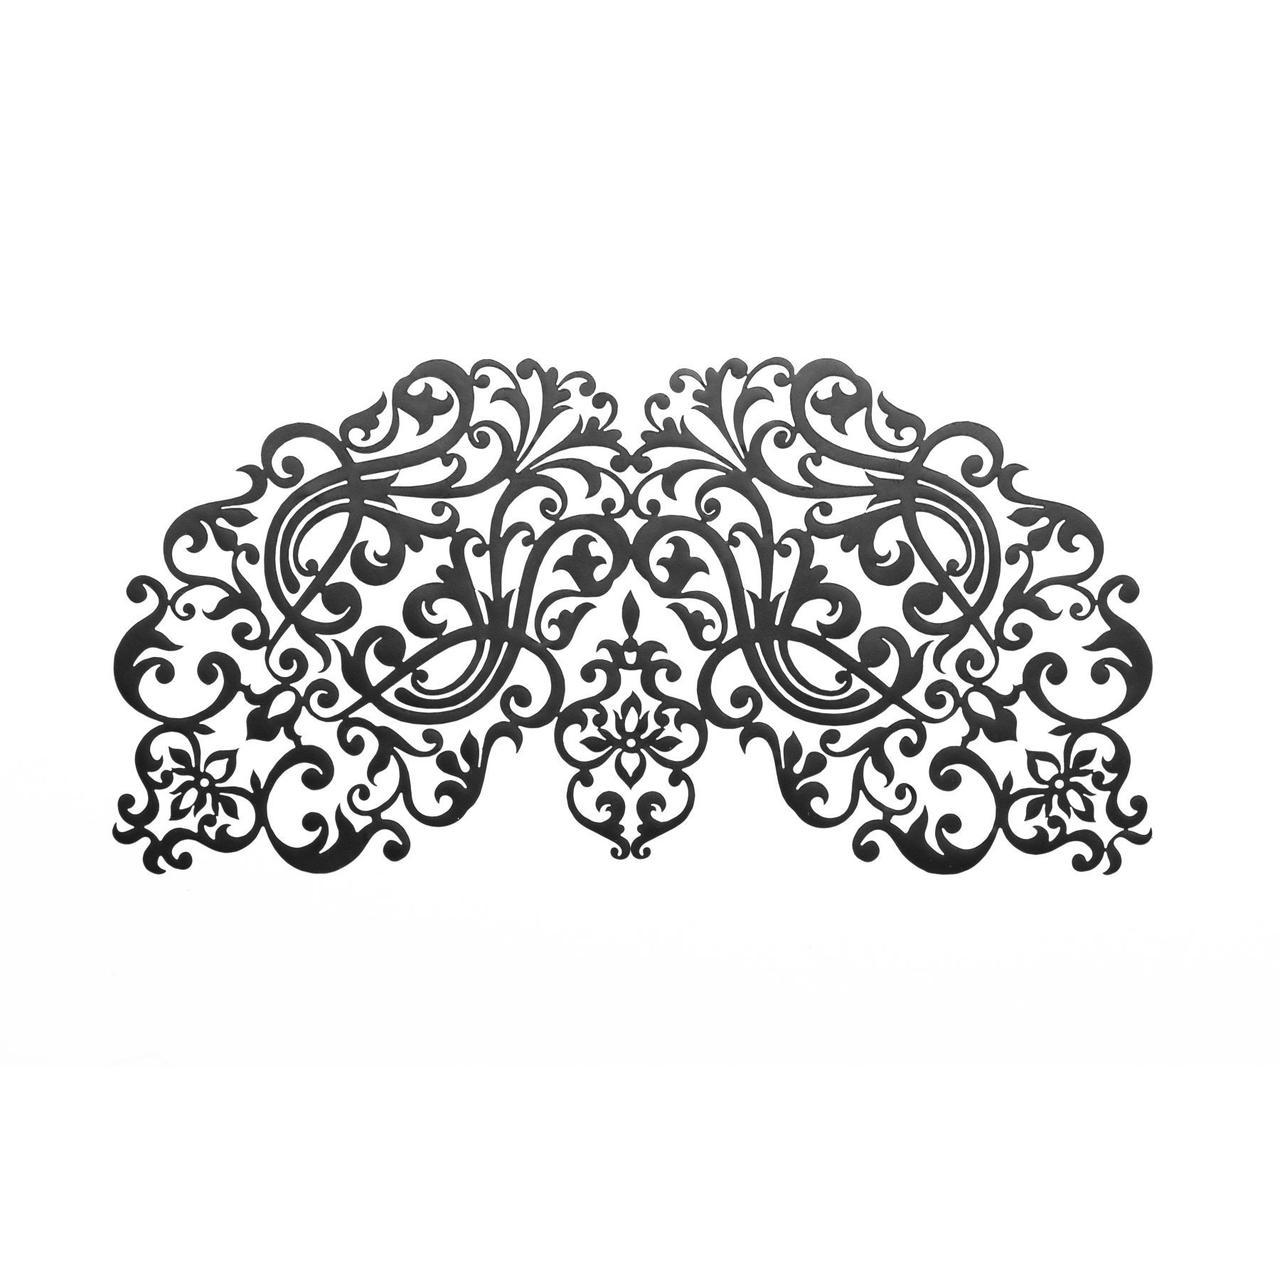 Маска на лицо Bijoux Indiscrets - Dalila Mask, виниловая, клеевое крепление, без завязок SO2331